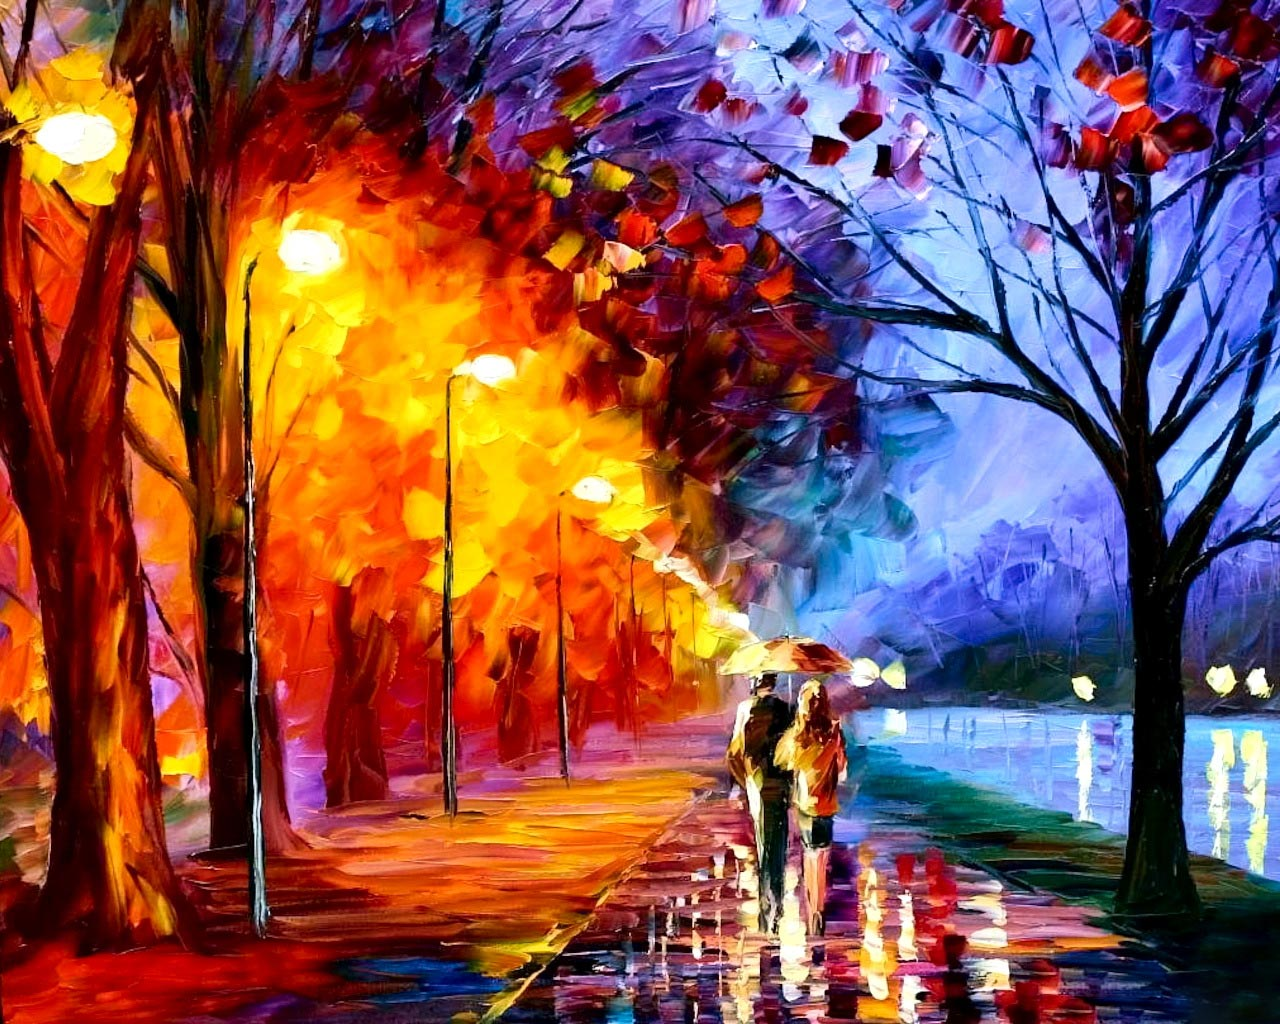 Oil Painting Wallpaper High Quality WallpapersWallpaper Desktop 1280x1024